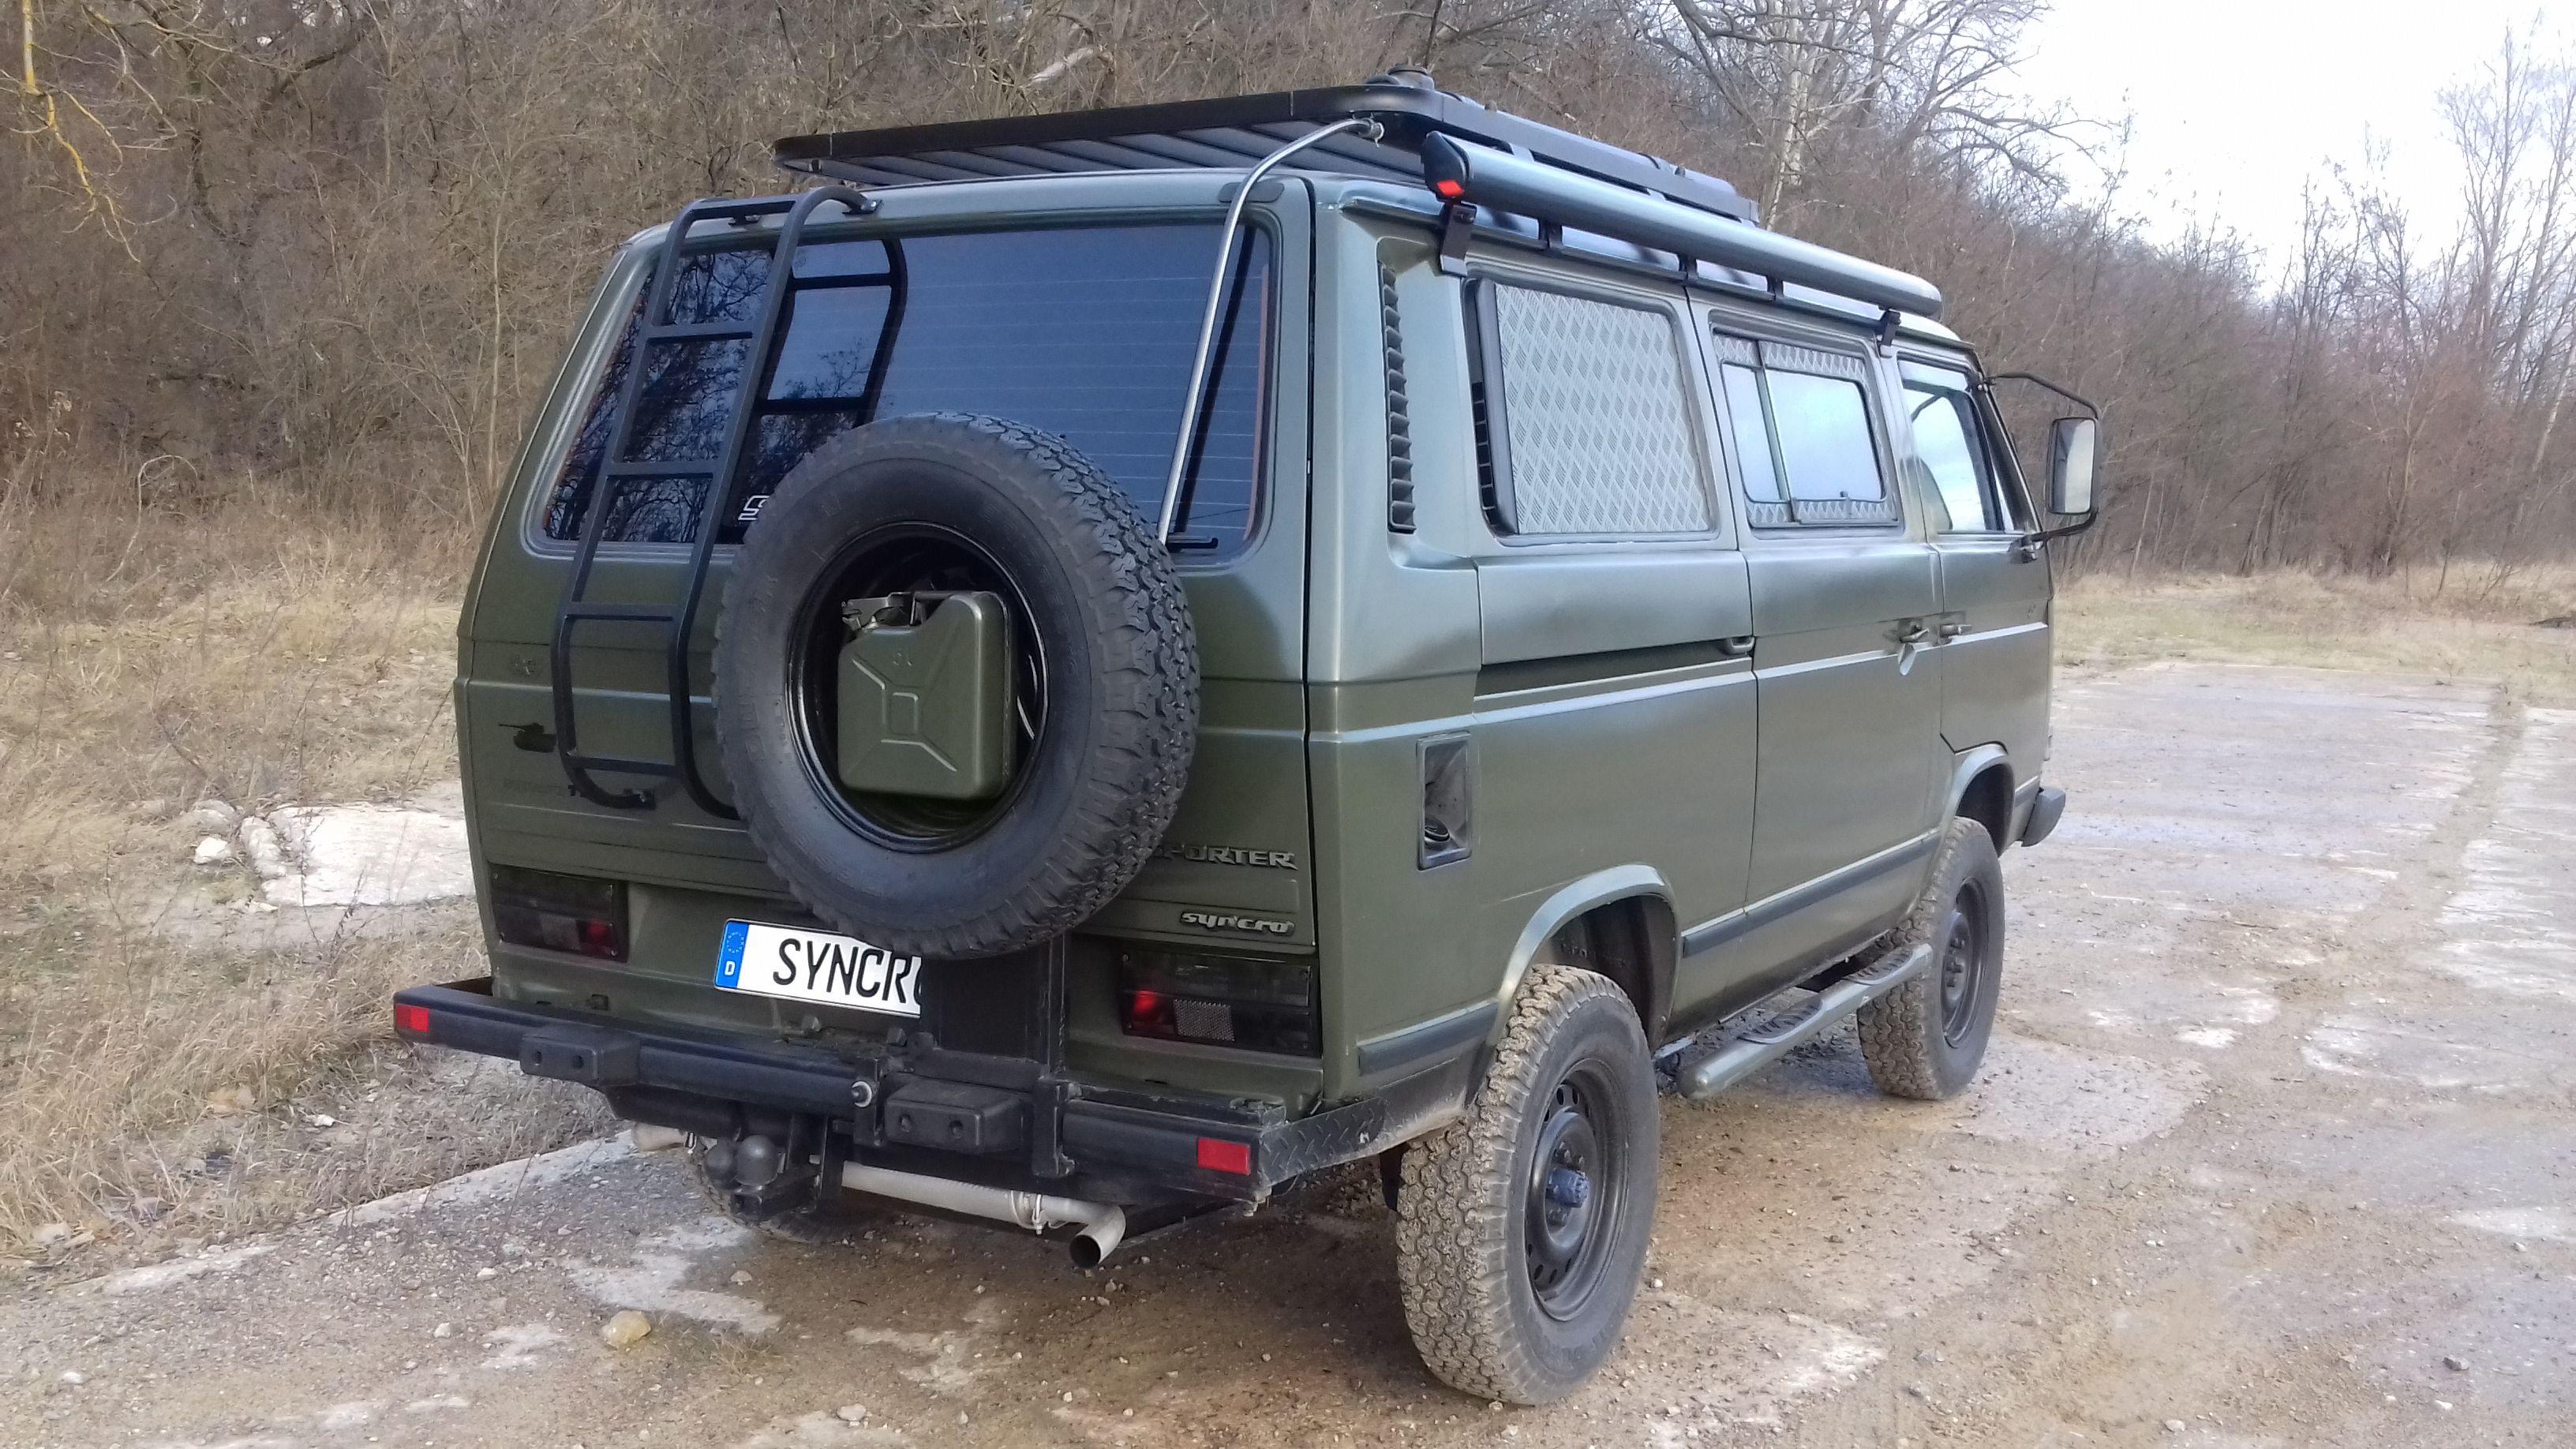 Vw T3 Syncro Camper 1 9 Tdi Forst61 Interia Pl Volkswagen Vw Transporter Van Life